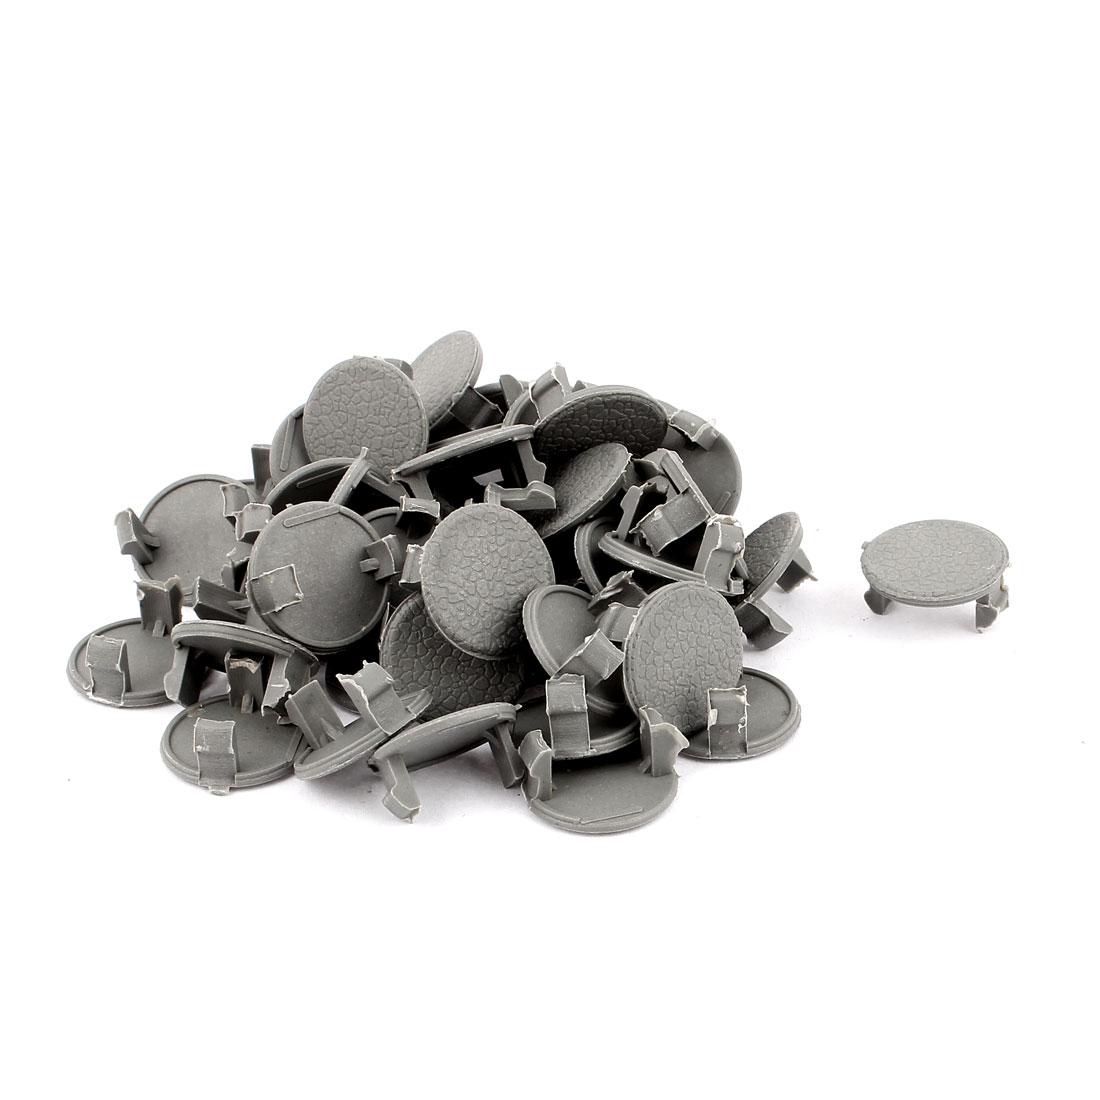 Plastic Rivets Auto Car Fastener Clips 22mm Head Diameter Gray 50 Pcs